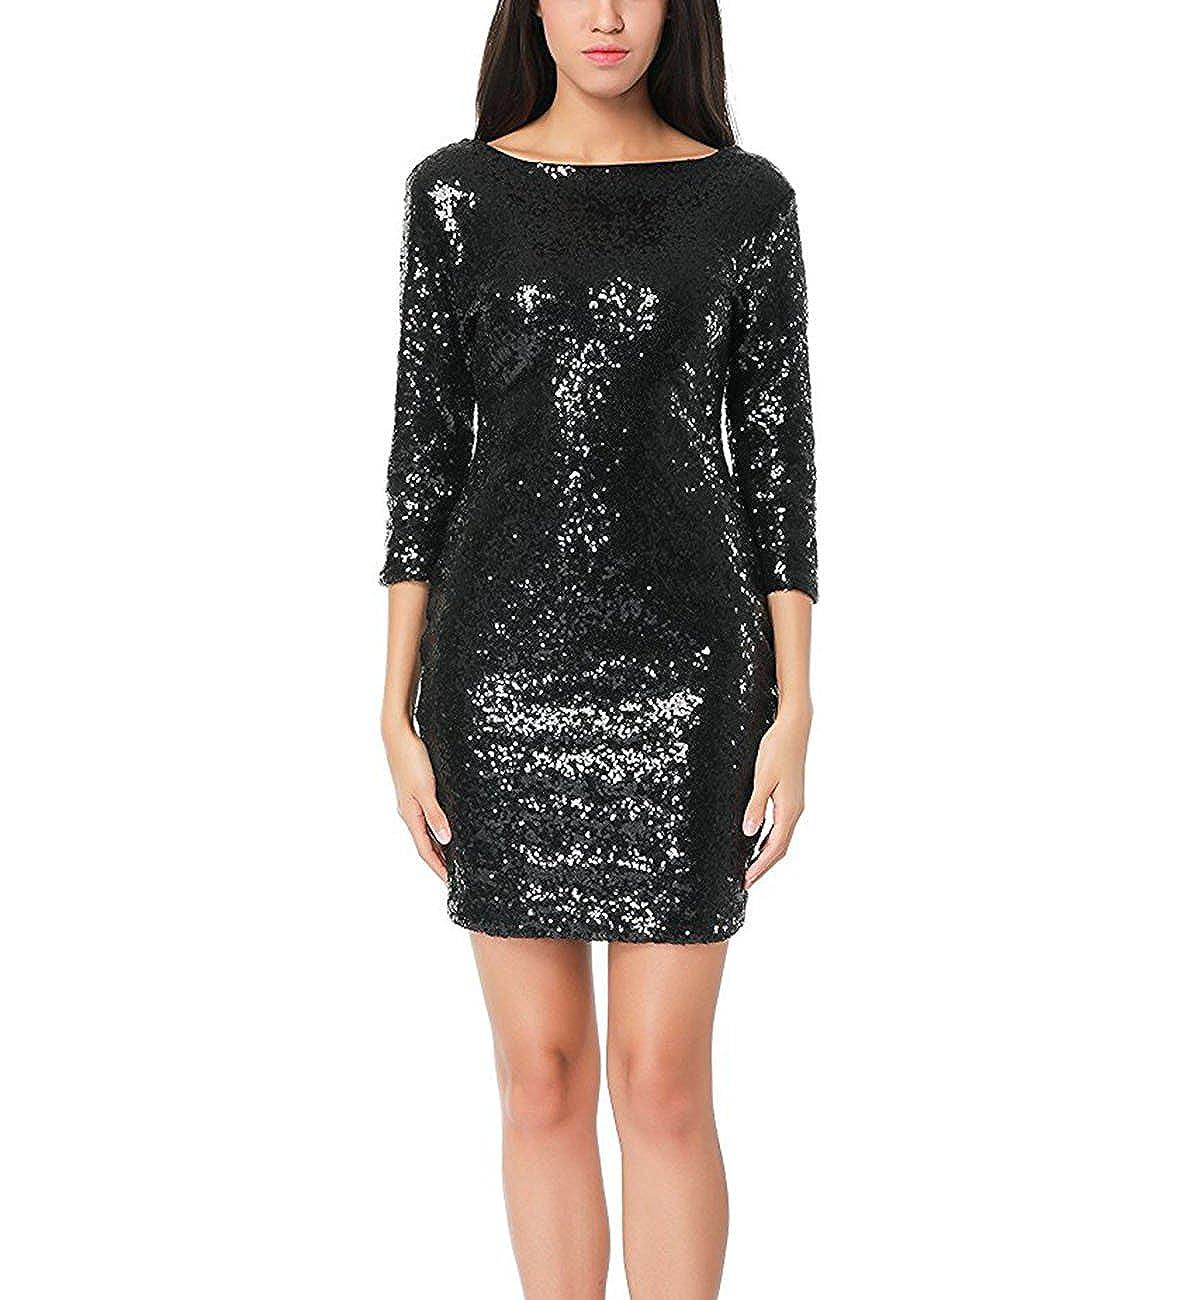 fbbbb76042 Doramode Women's Sexy Glitter 3/4 Sleeves Backless Zipper Bodycon Short  Pencil Club Dress